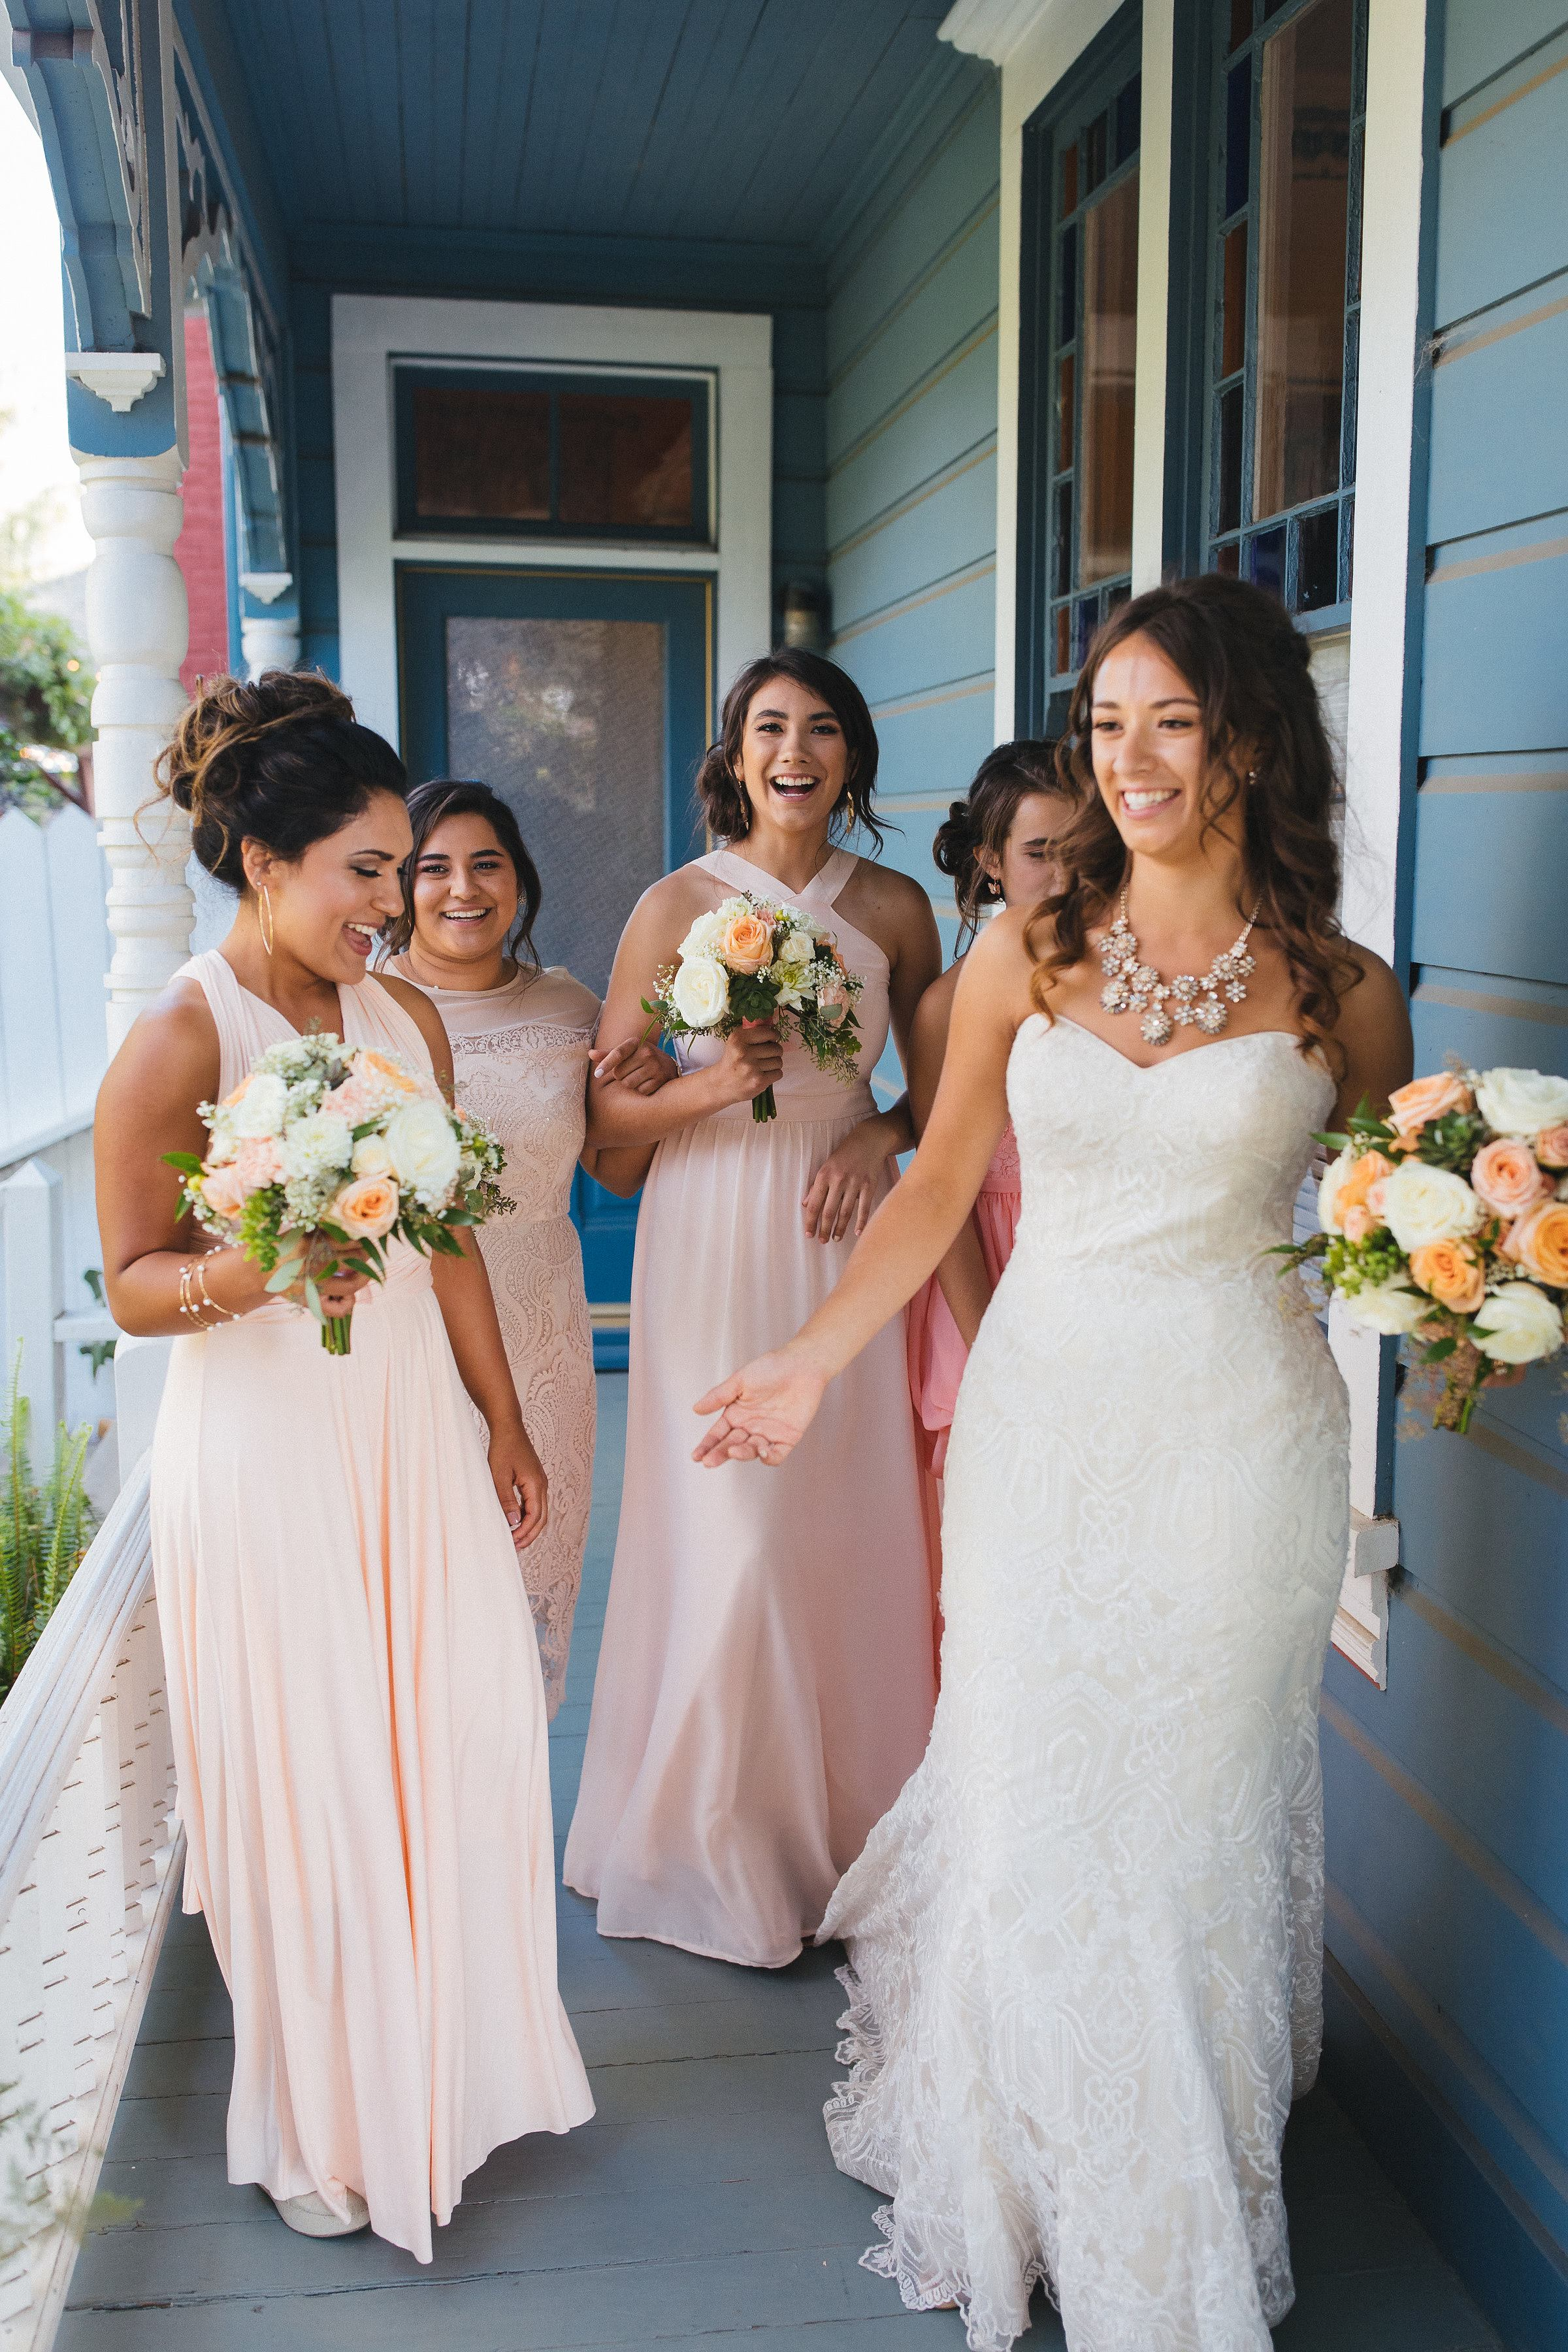 Evhan-Madi-Wedding-373.jpg